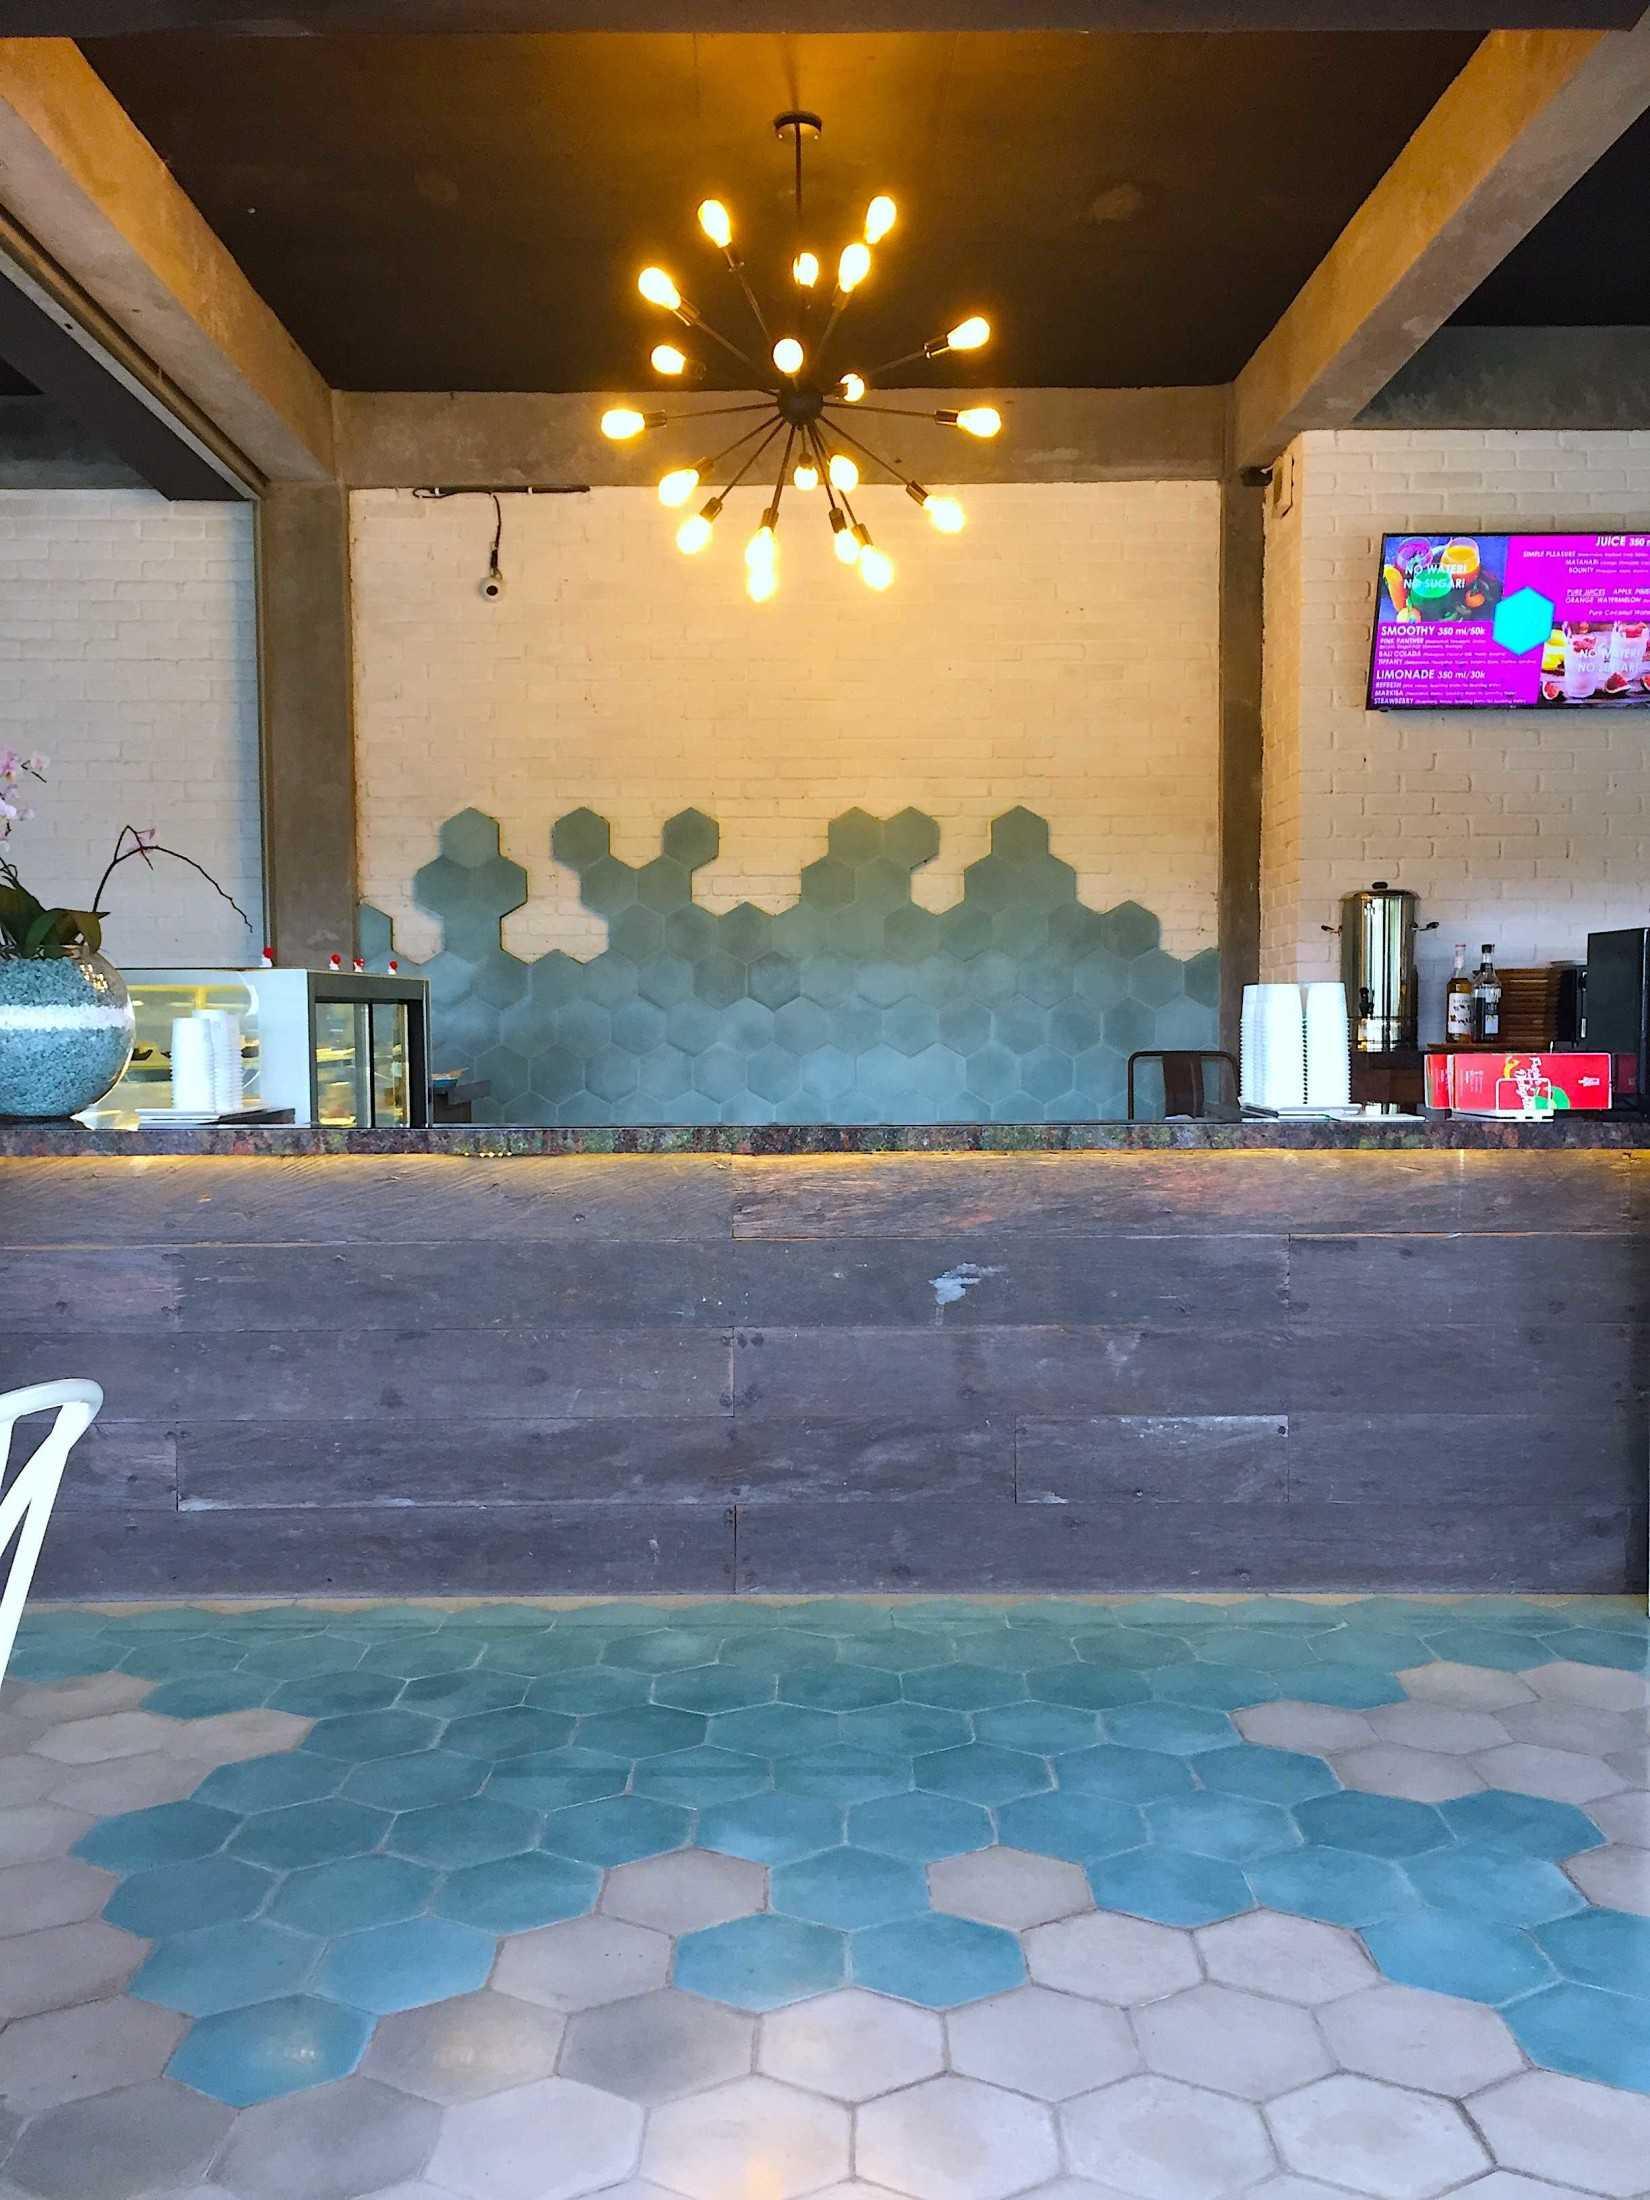 Studio Asri By-Gelato Cafe Tegallalang, Kabupaten Gianyar, Bali, Indonesia Tegallalang, Kabupaten Gianyar, Bali, Indonesia Studio-Asri-By-Gelato-Cafe  58859